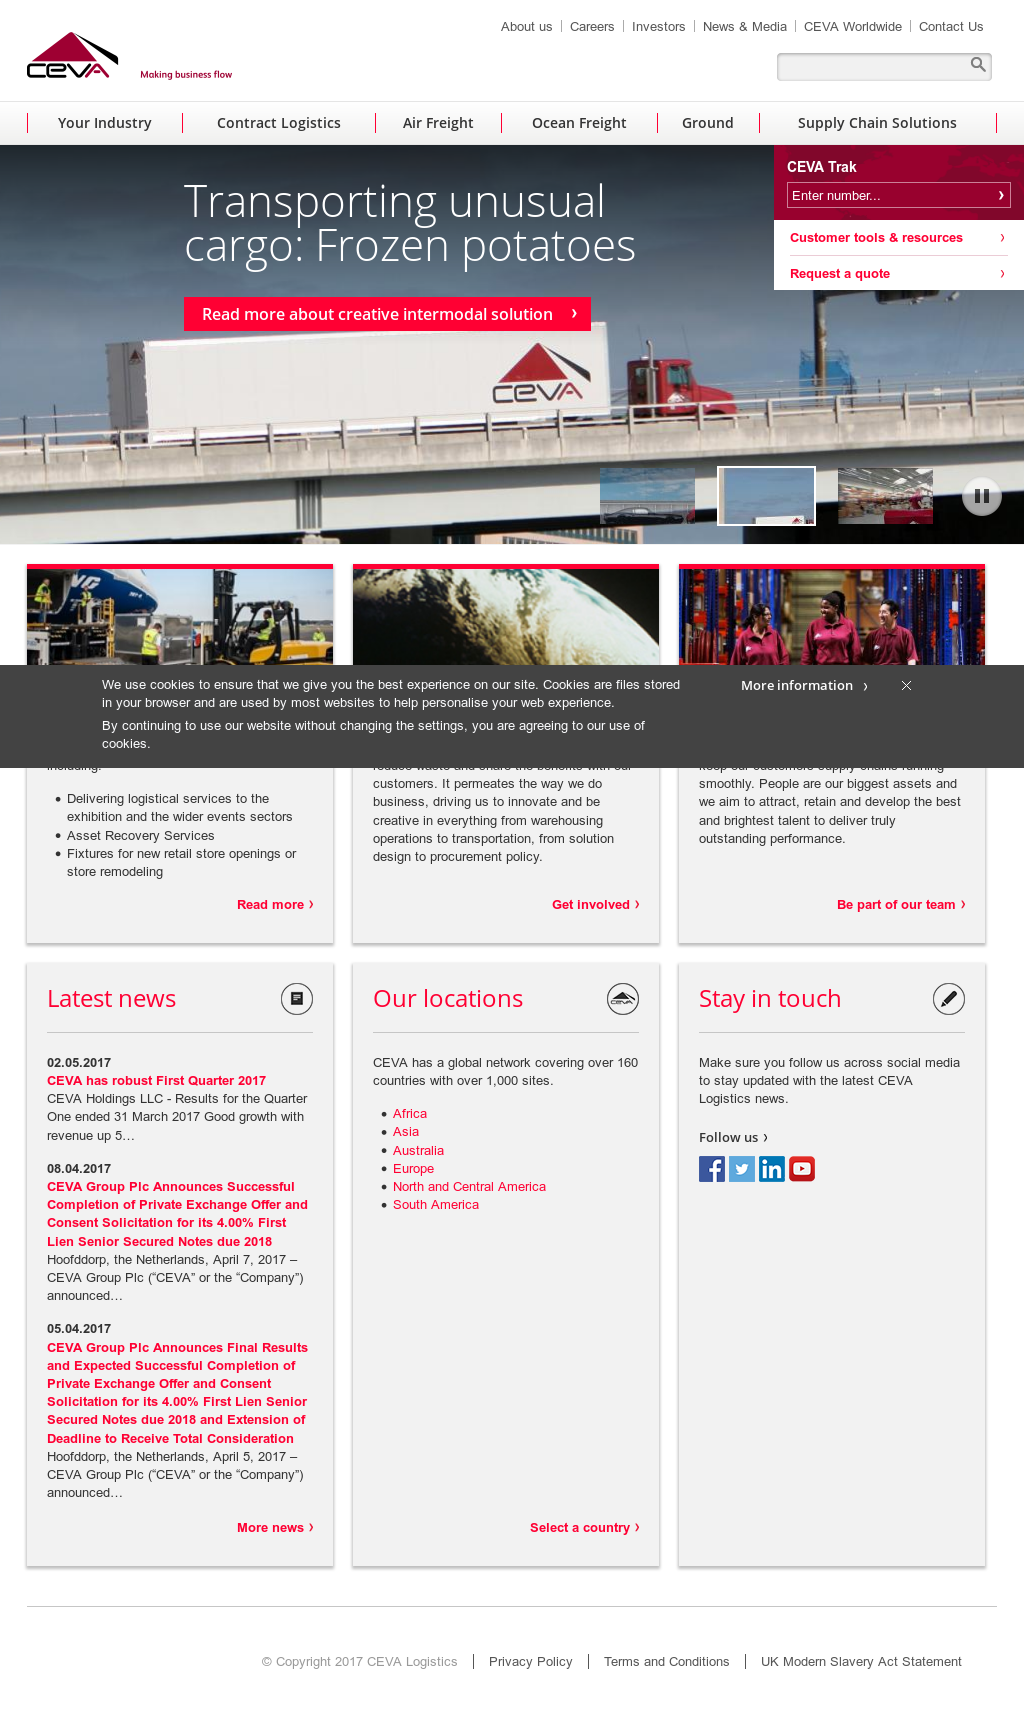 CEVA Competitors, Revenue and Employees - Owler Company Profile